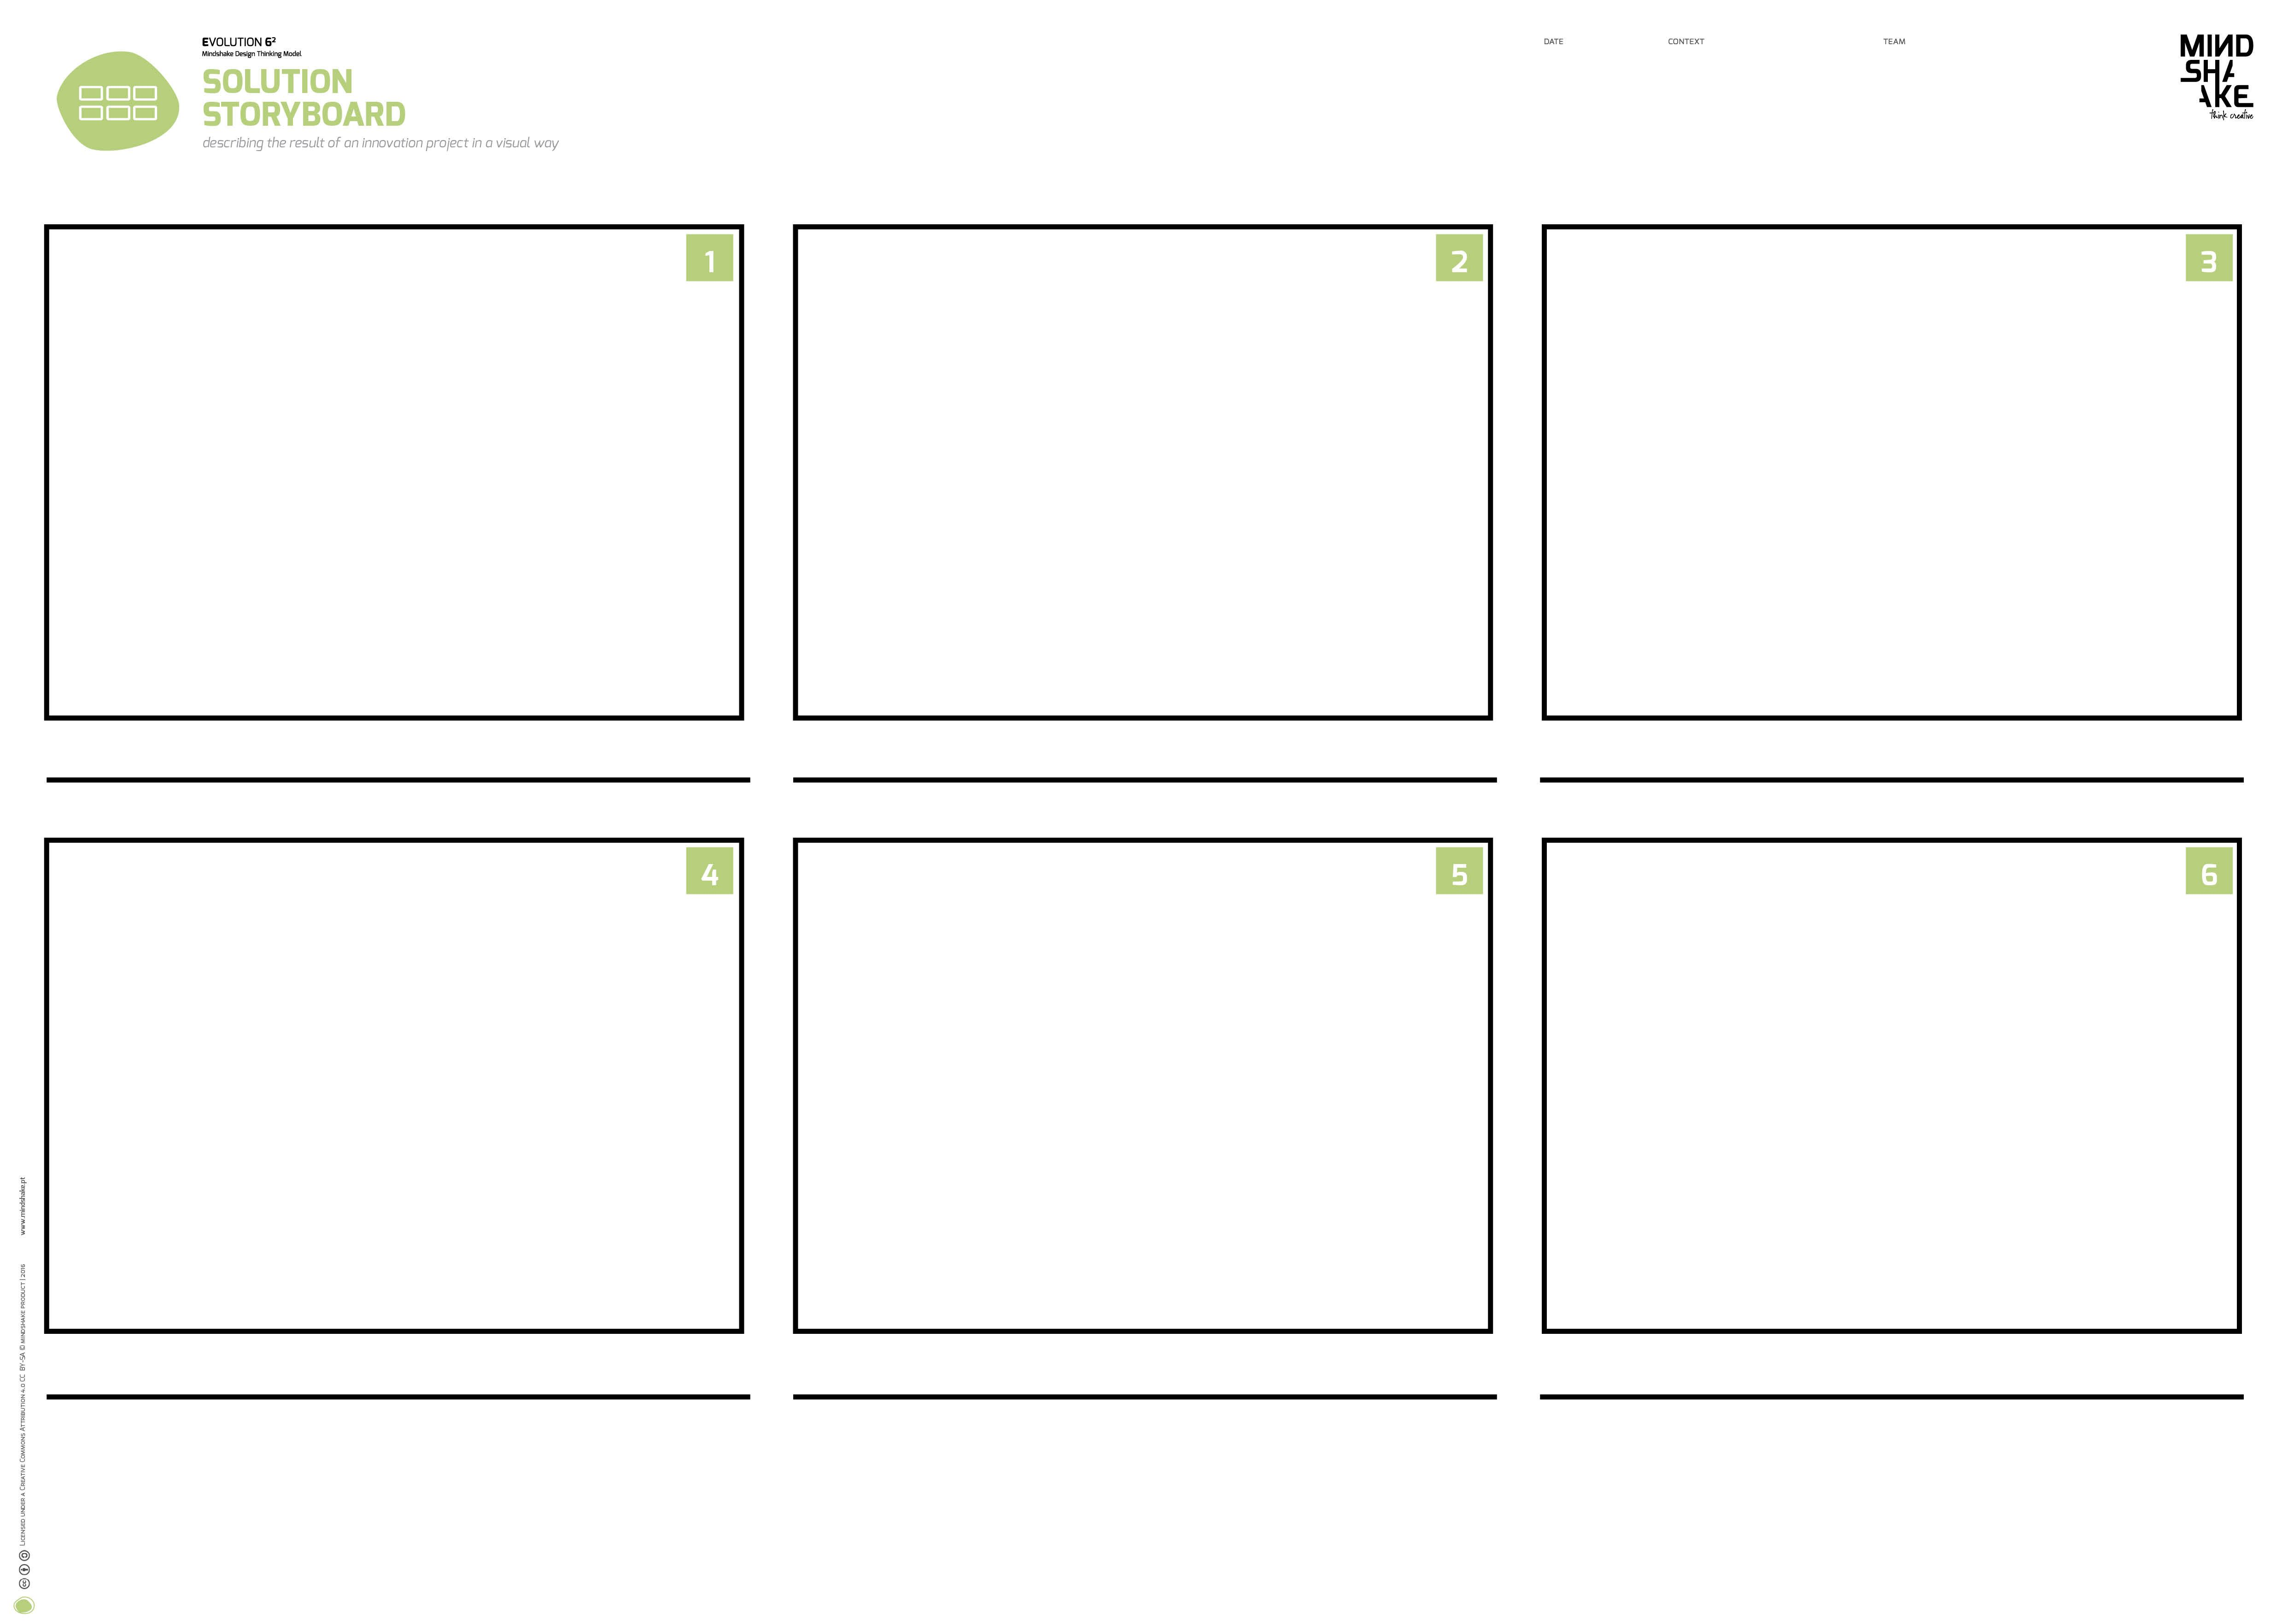 Solution Storyboard Mindshake Design Thinking Templates Pdf